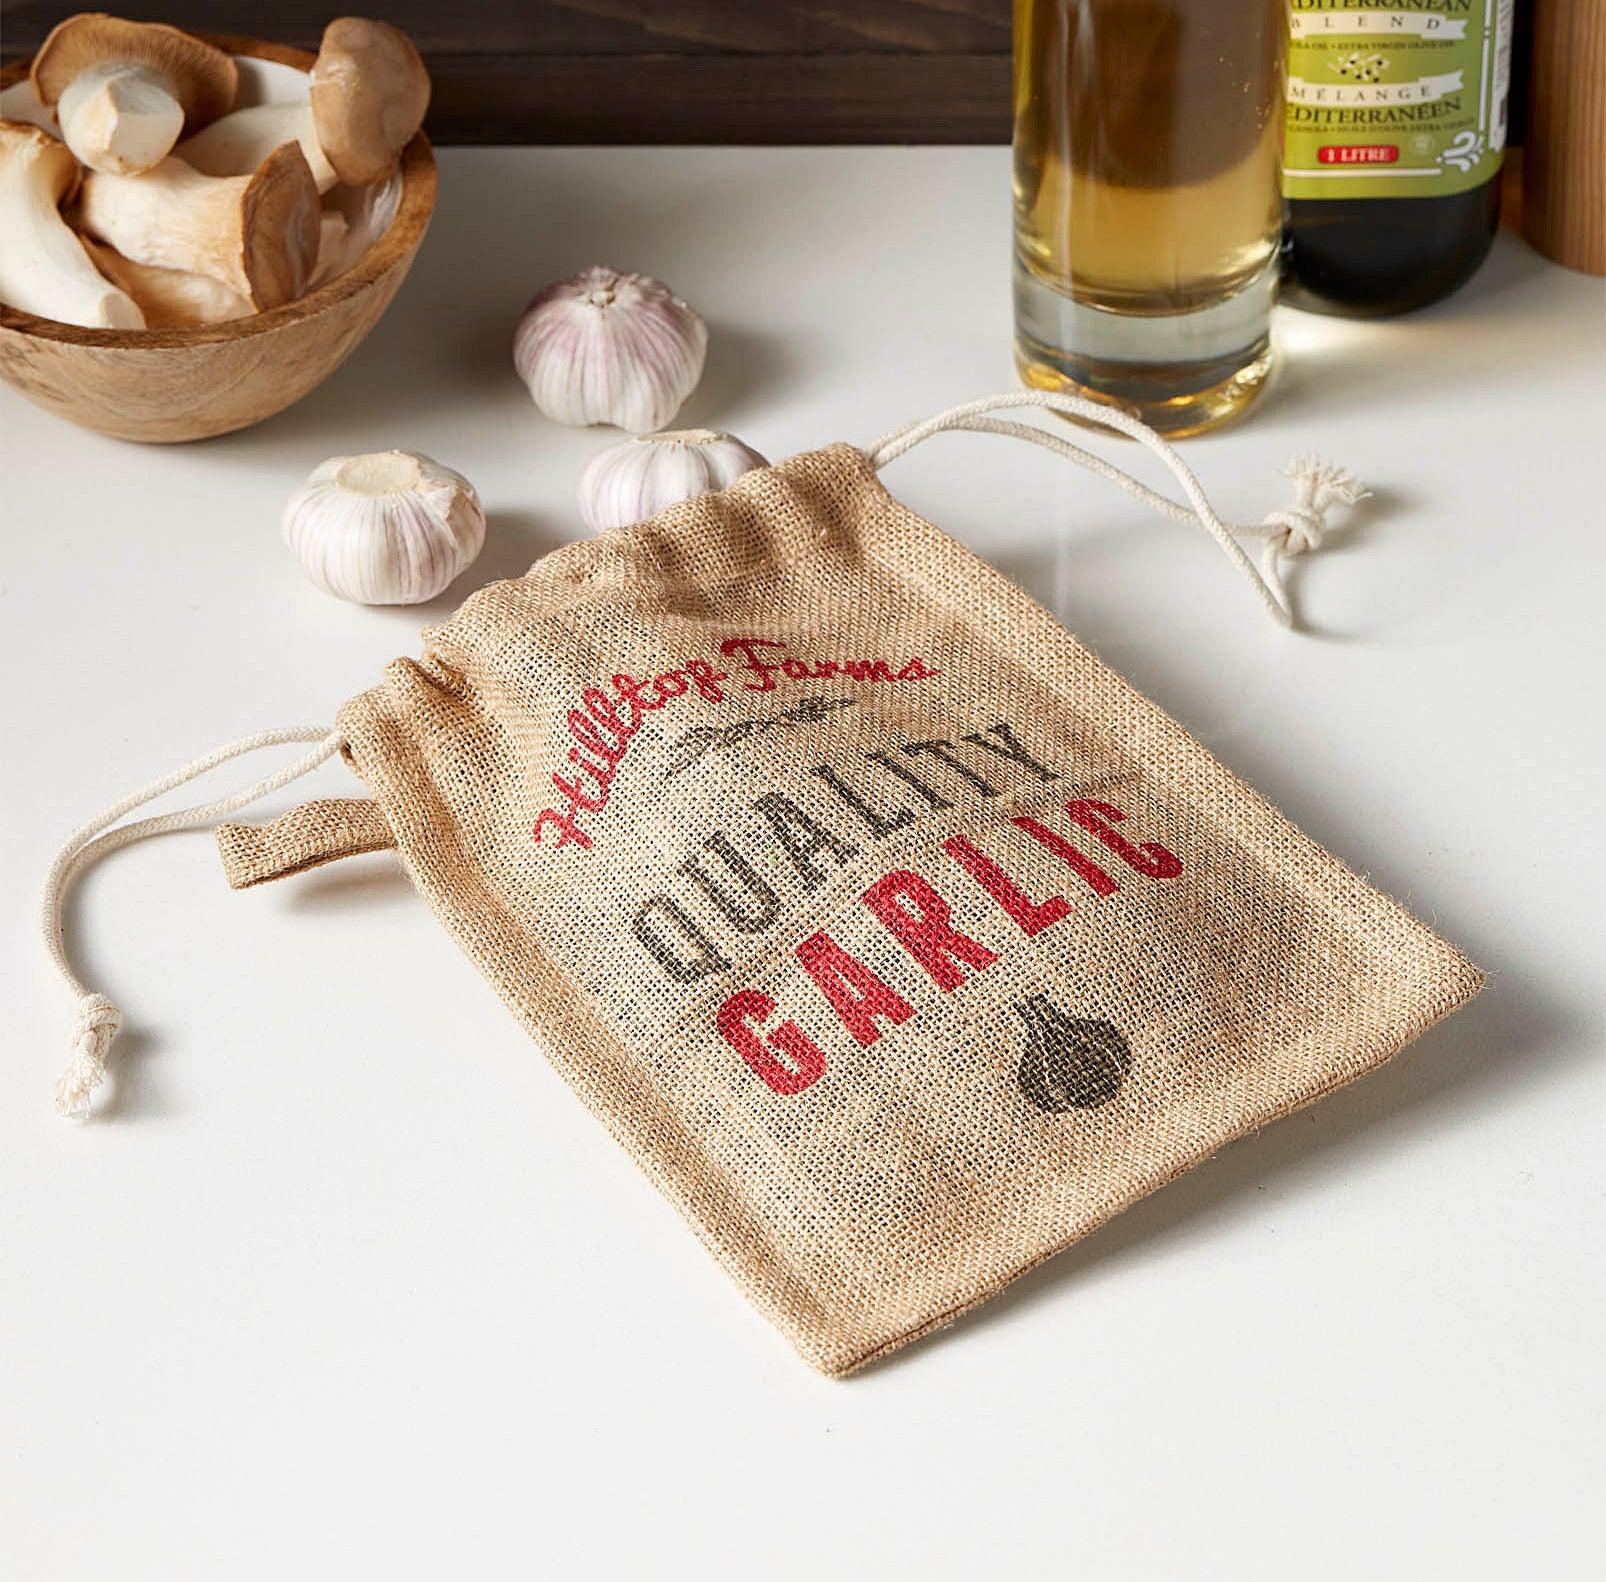 Several bulbs of garlic coming out of the garlic sack